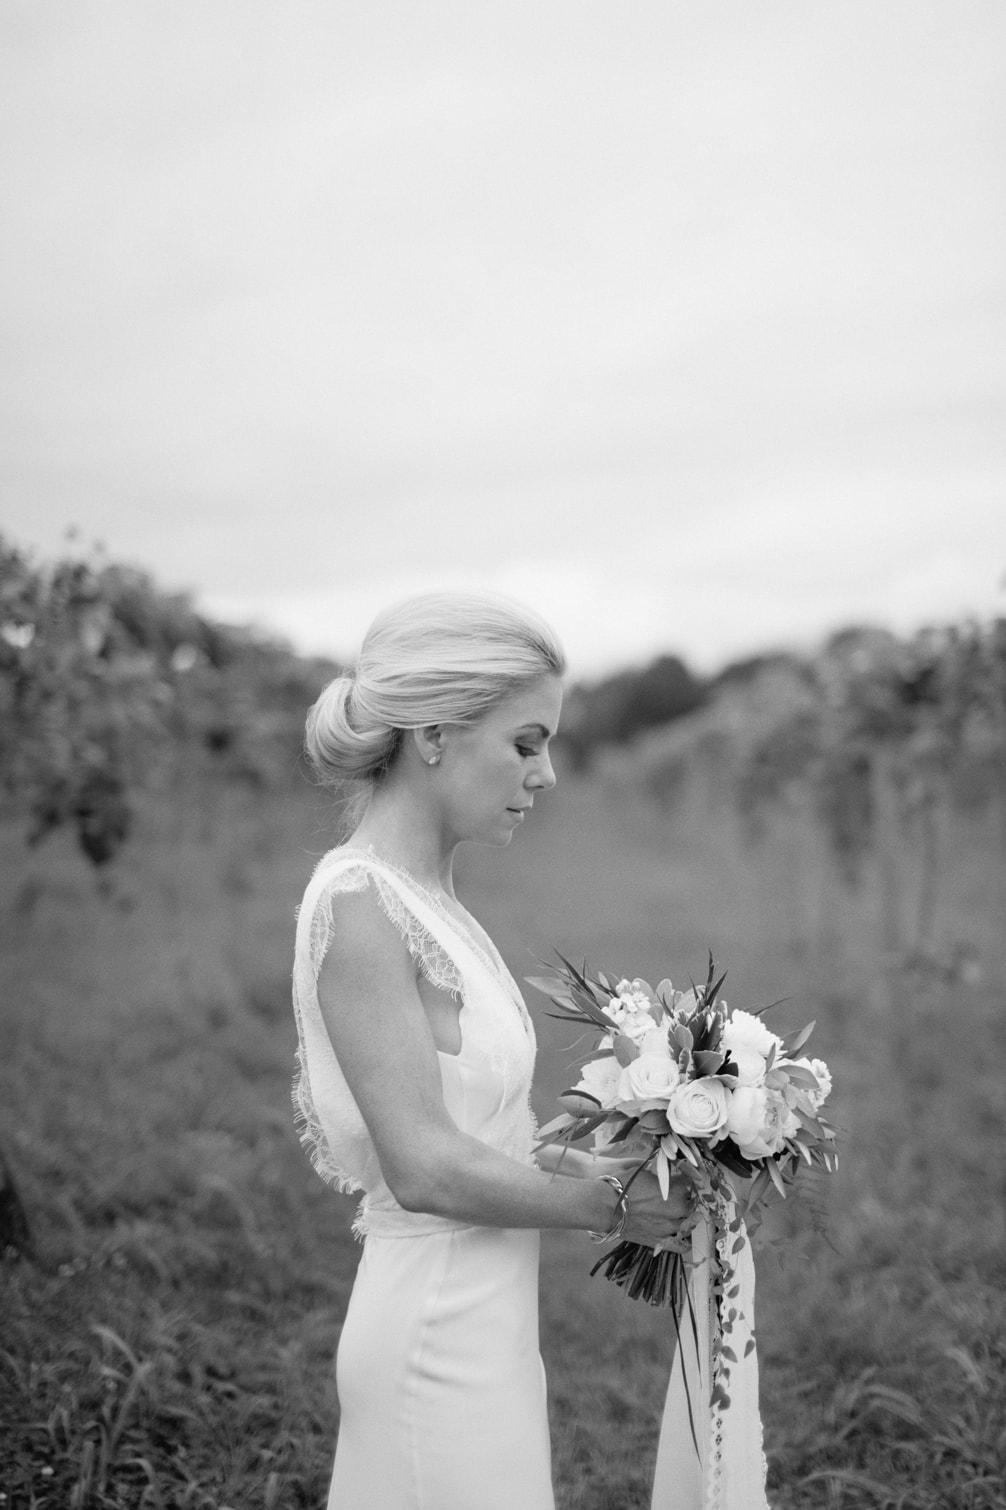 Nicole and Drew's Homespun Chic Hidden Vineyard Barn Wedding